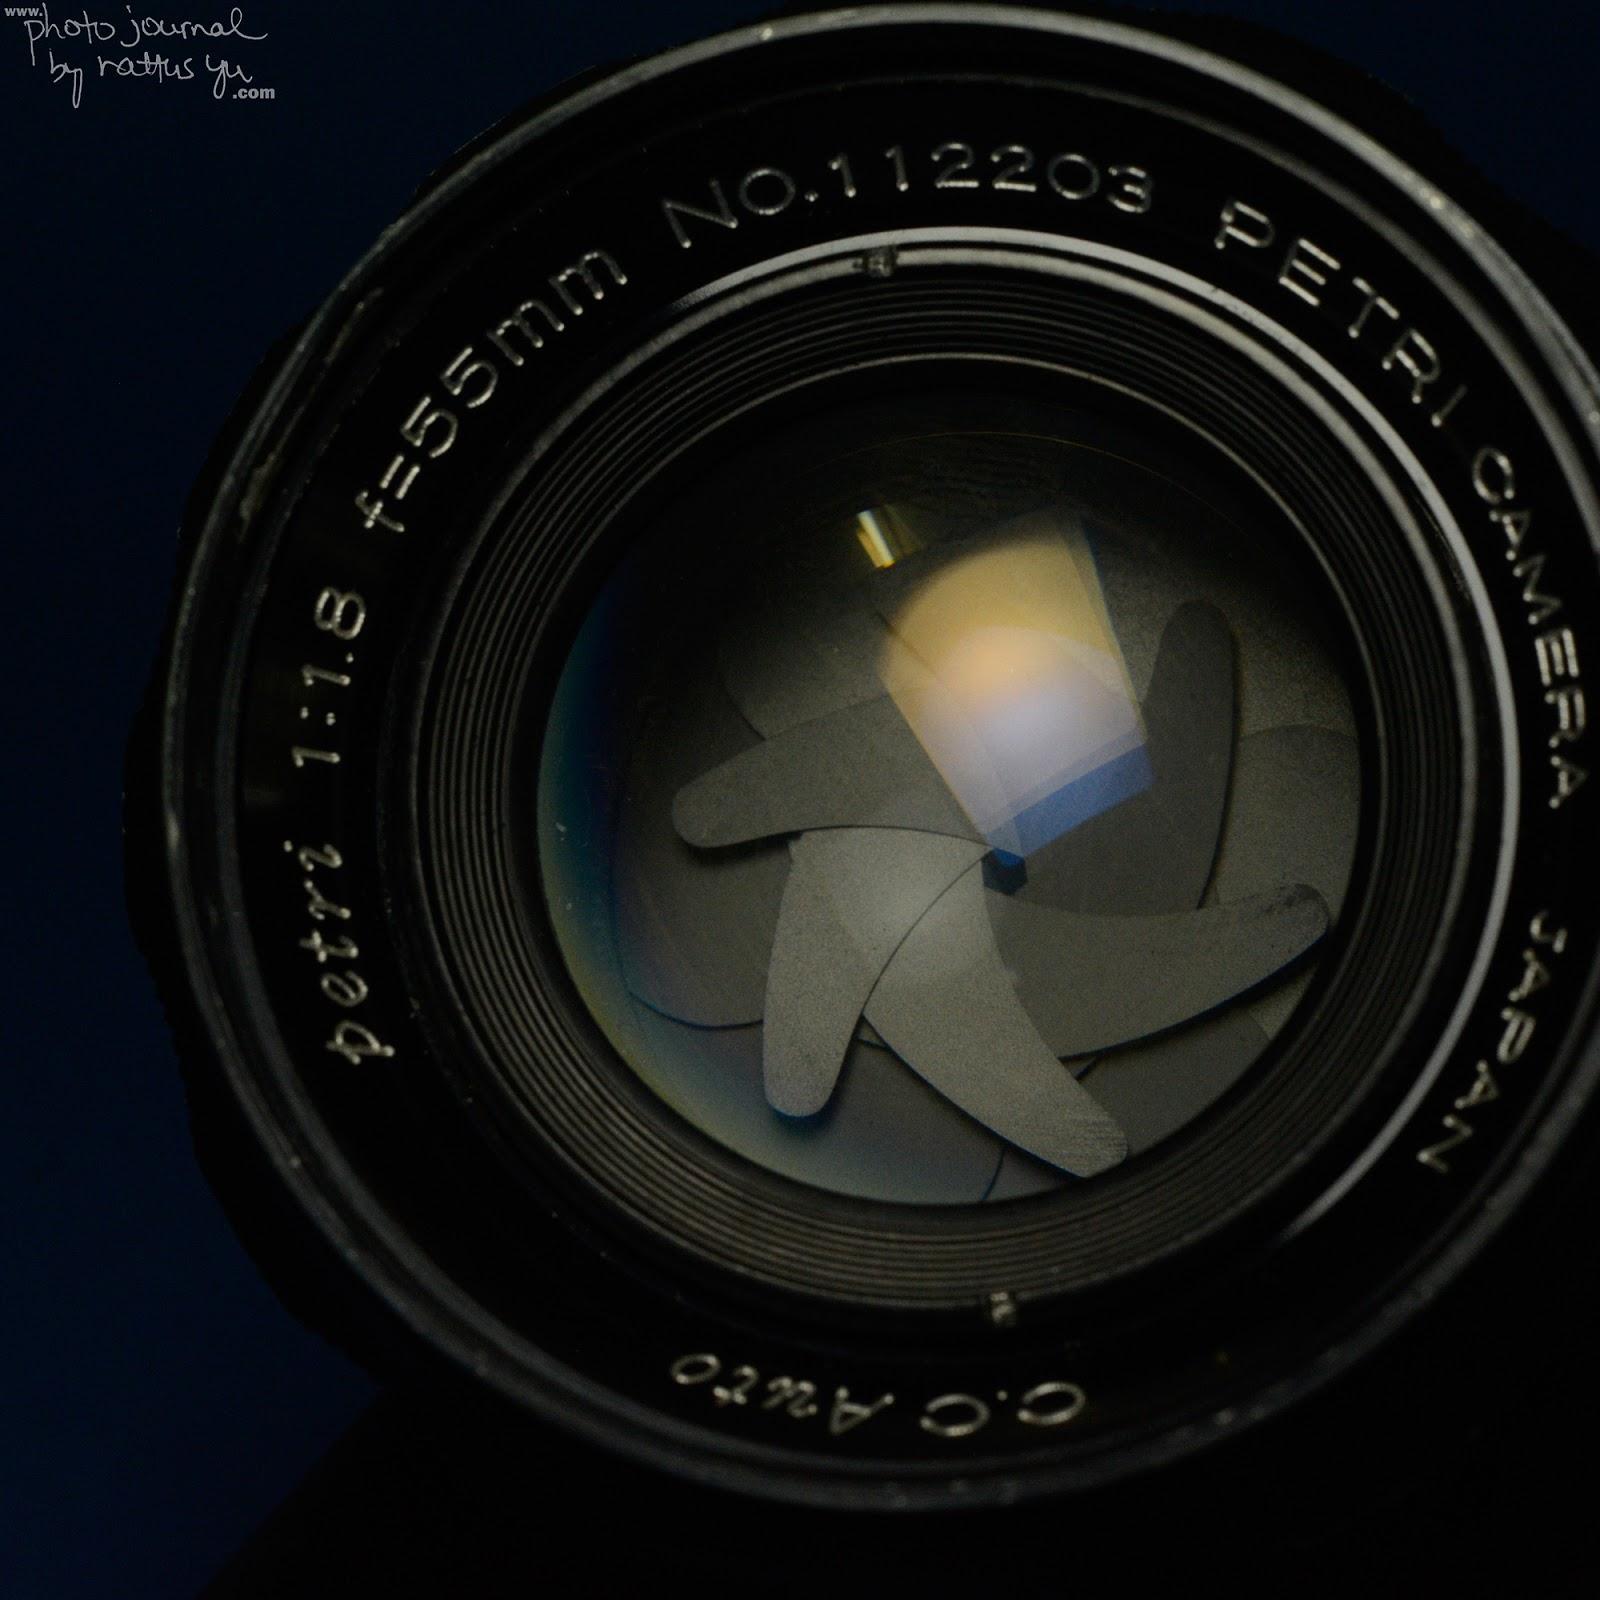 Petri 55/1.8 Petri Bayonet Mount to Nikon with Infinity